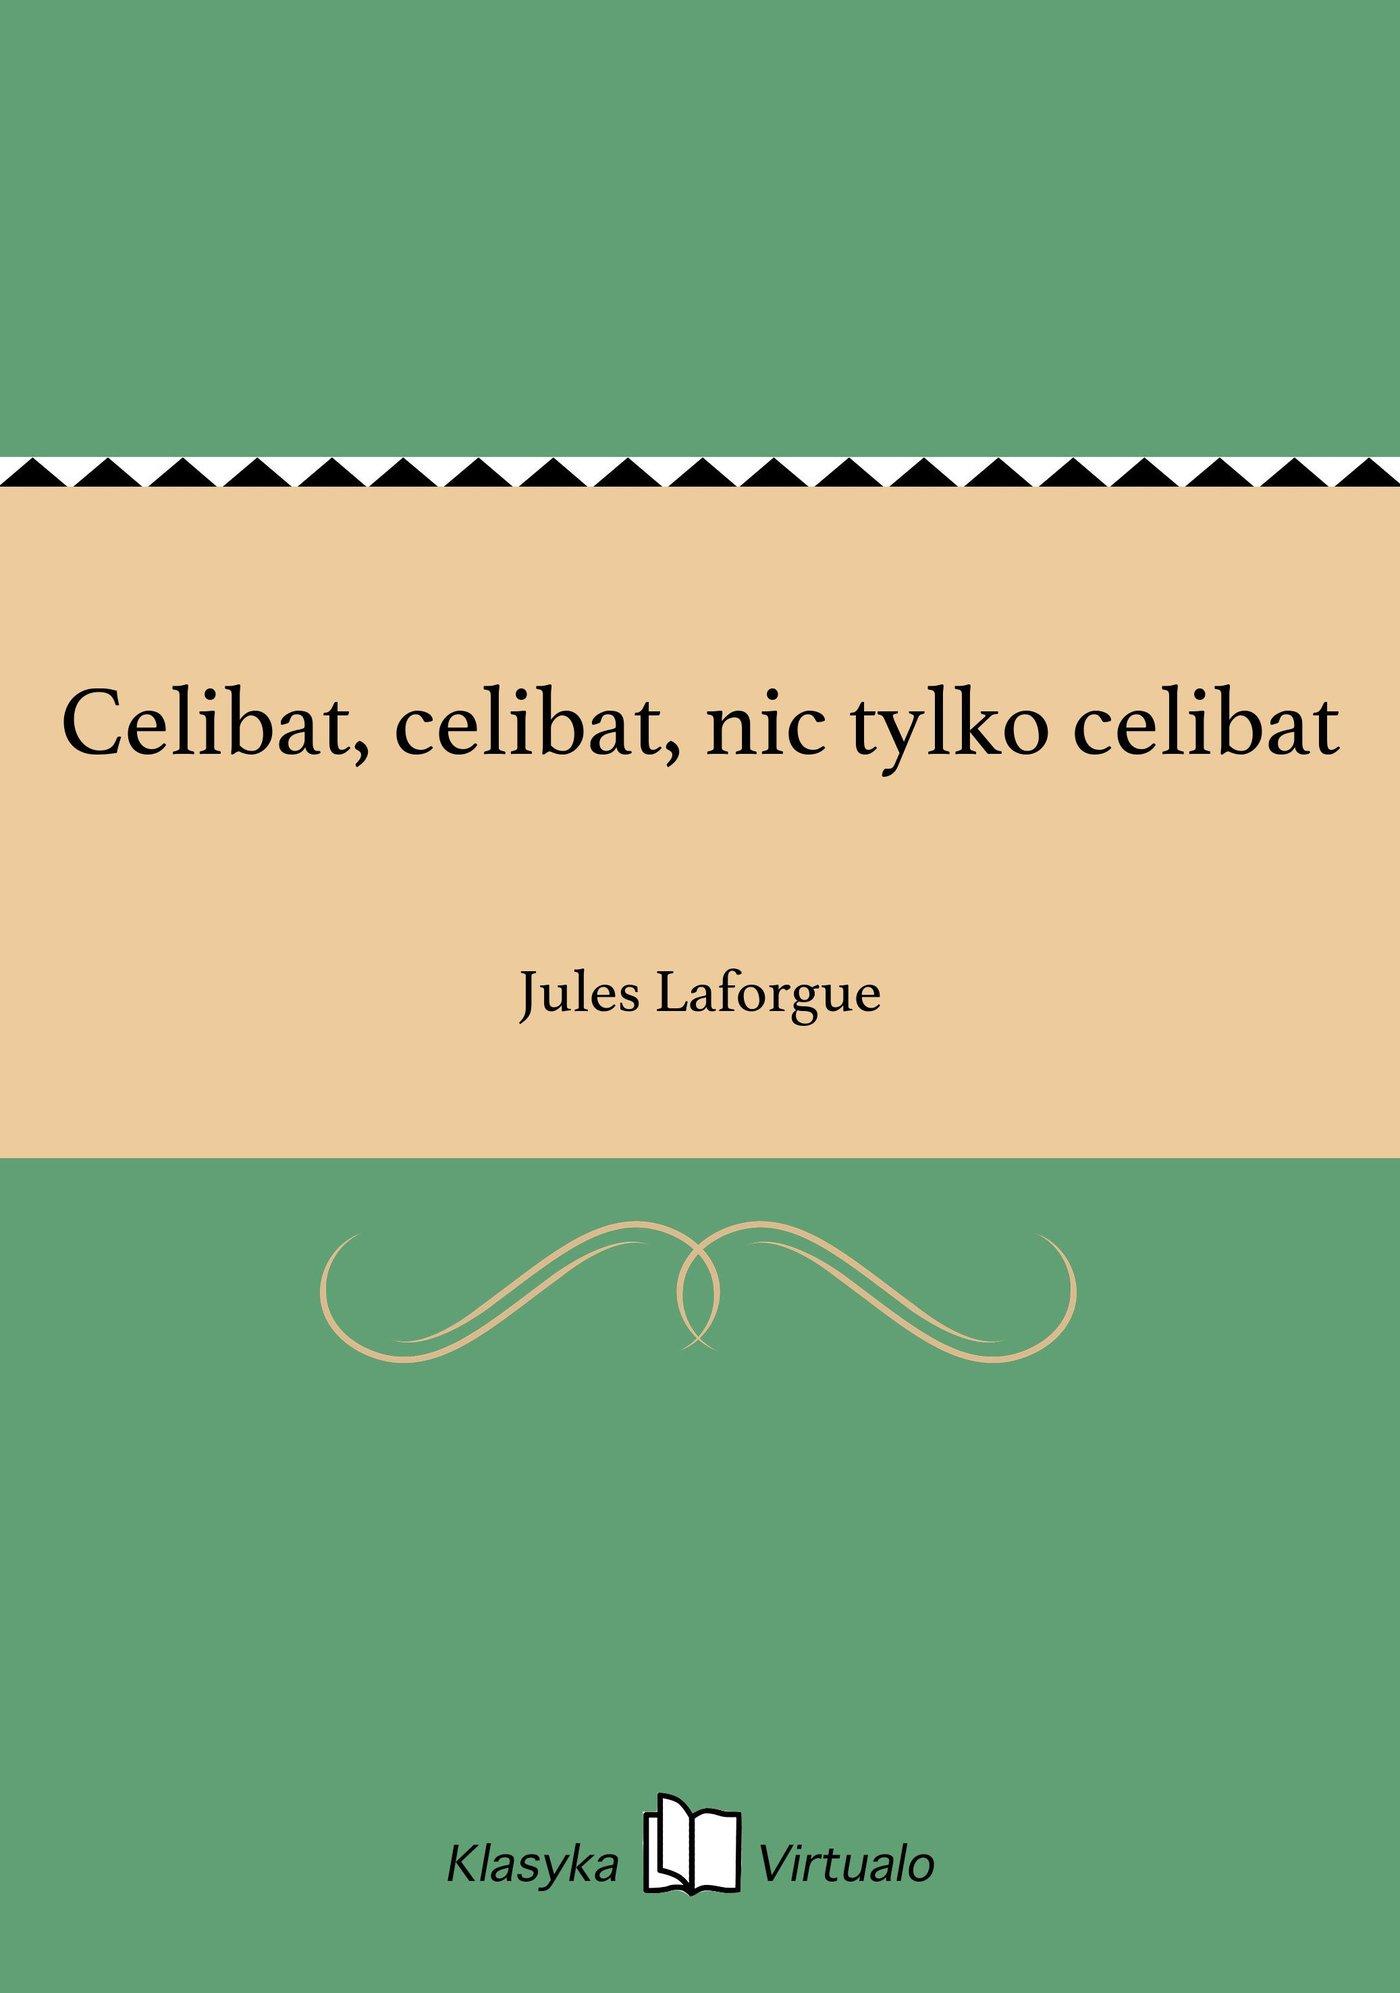 Celibat, celibat, nic tylko celibat - Ebook (Książka EPUB) do pobrania w formacie EPUB